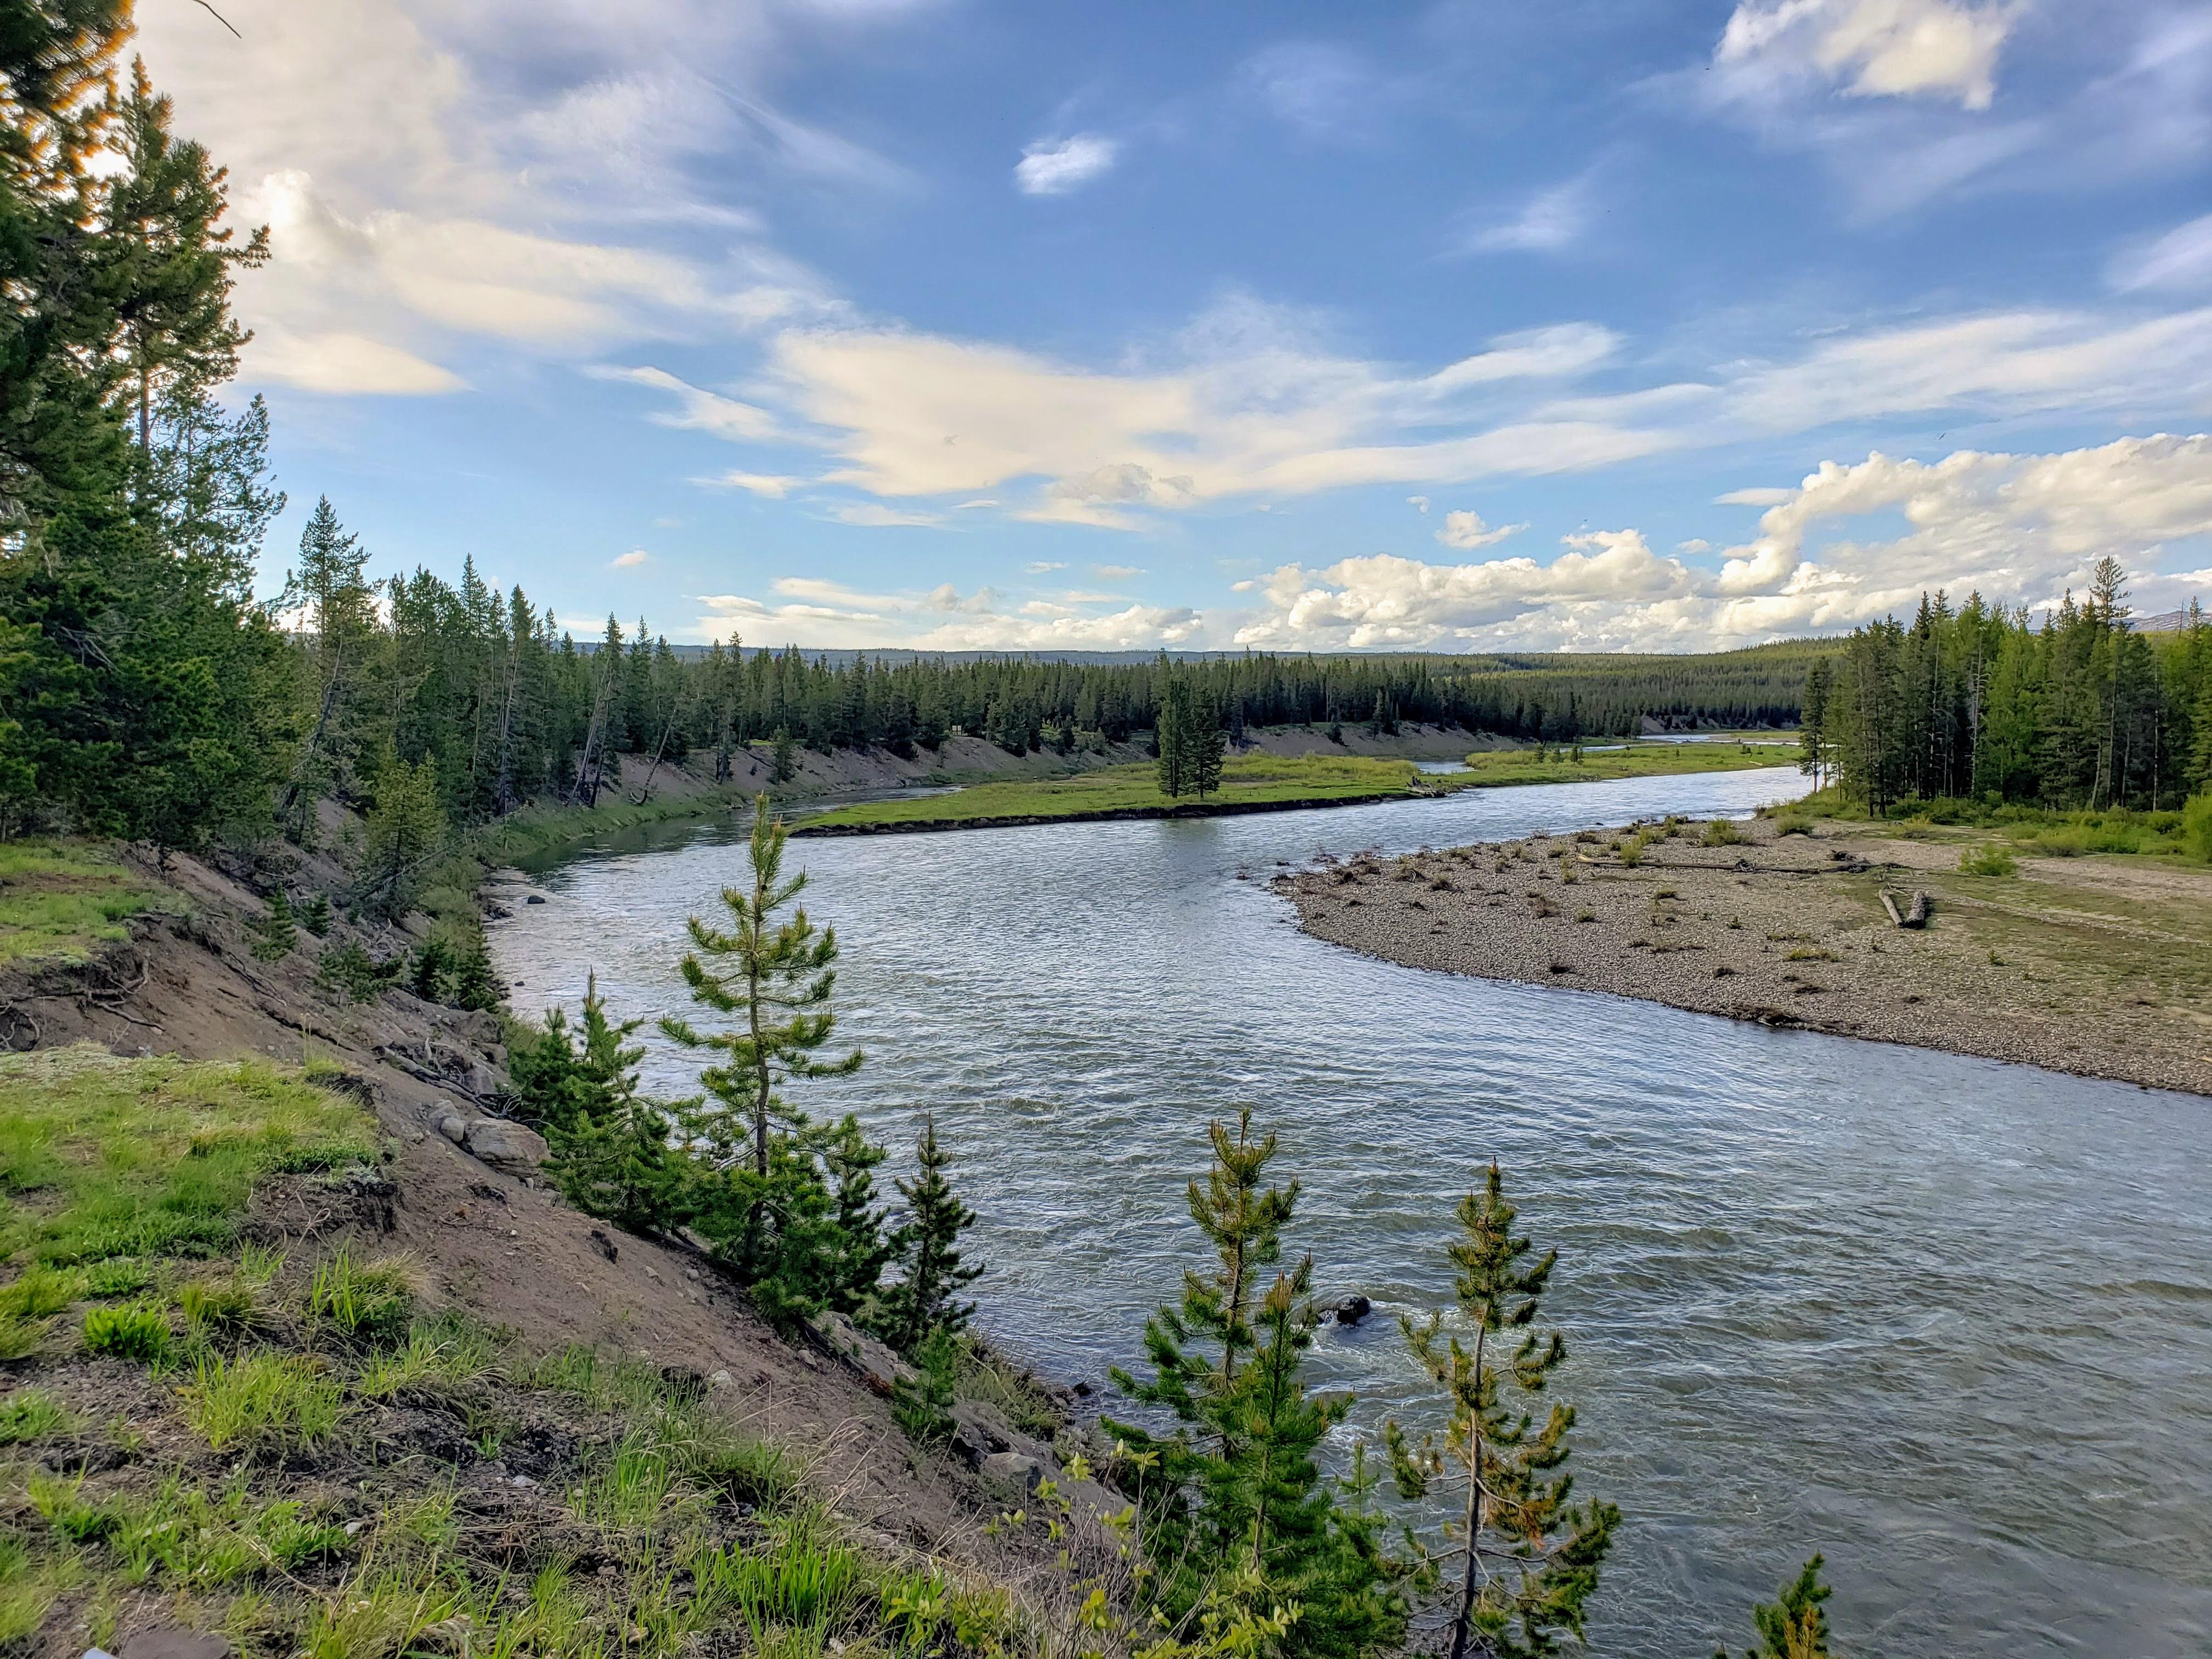 Yellowstone & Grand Tetons National Park, WY, USA – 2 Day Trip